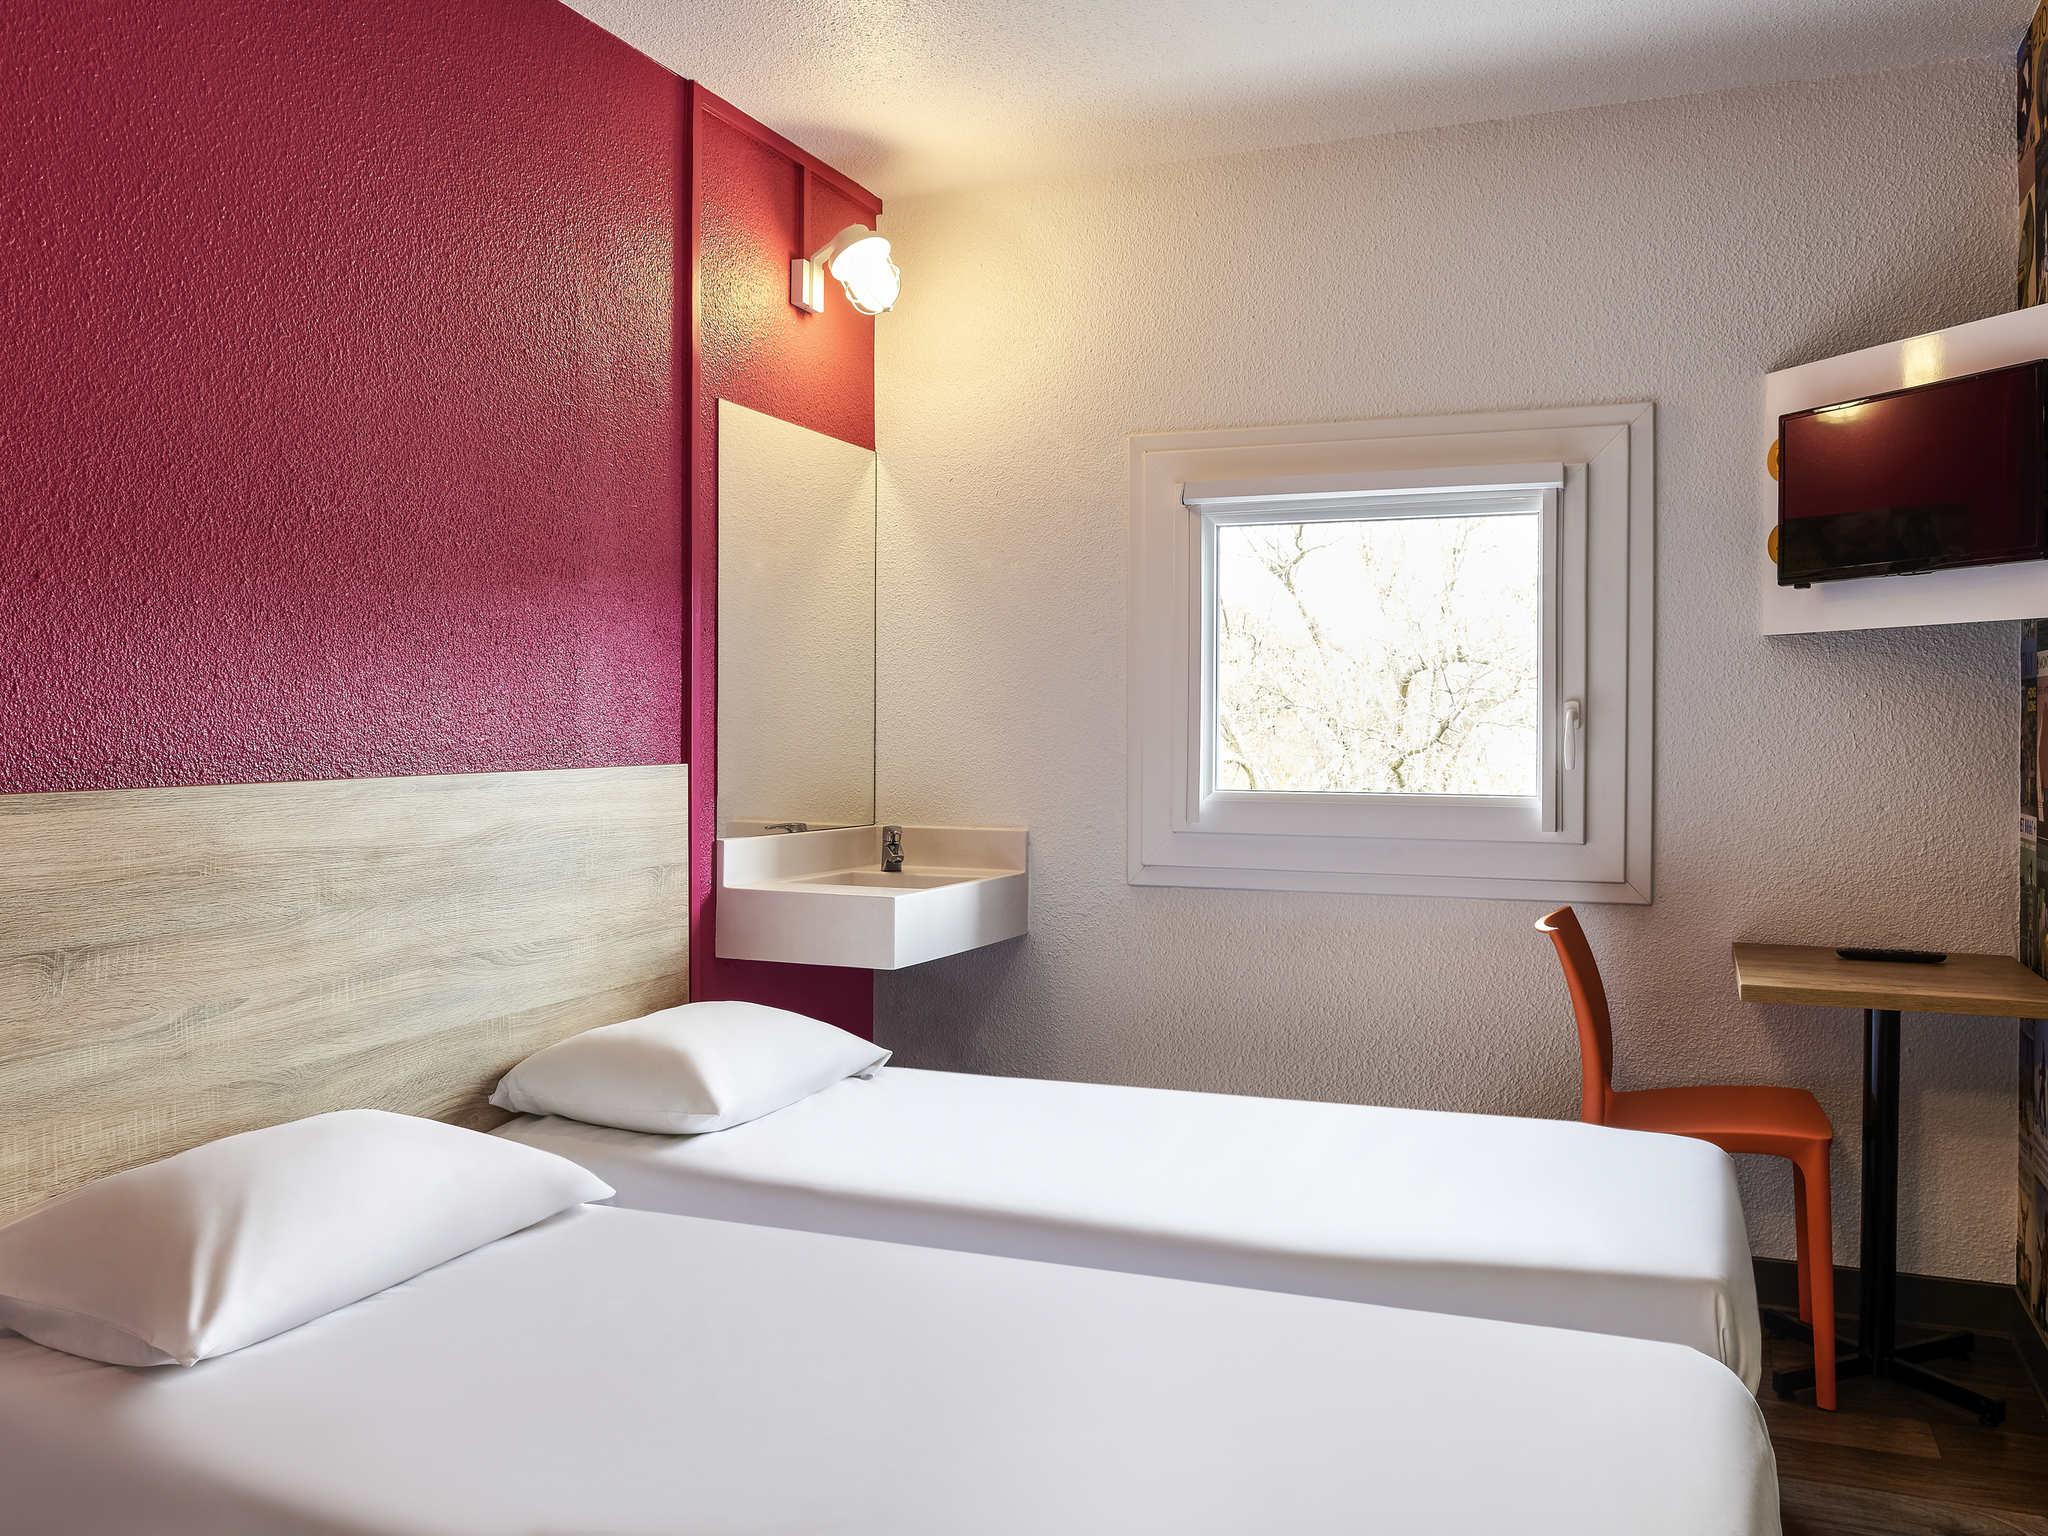 Hotell – hotelF1 Aix-en-Provence